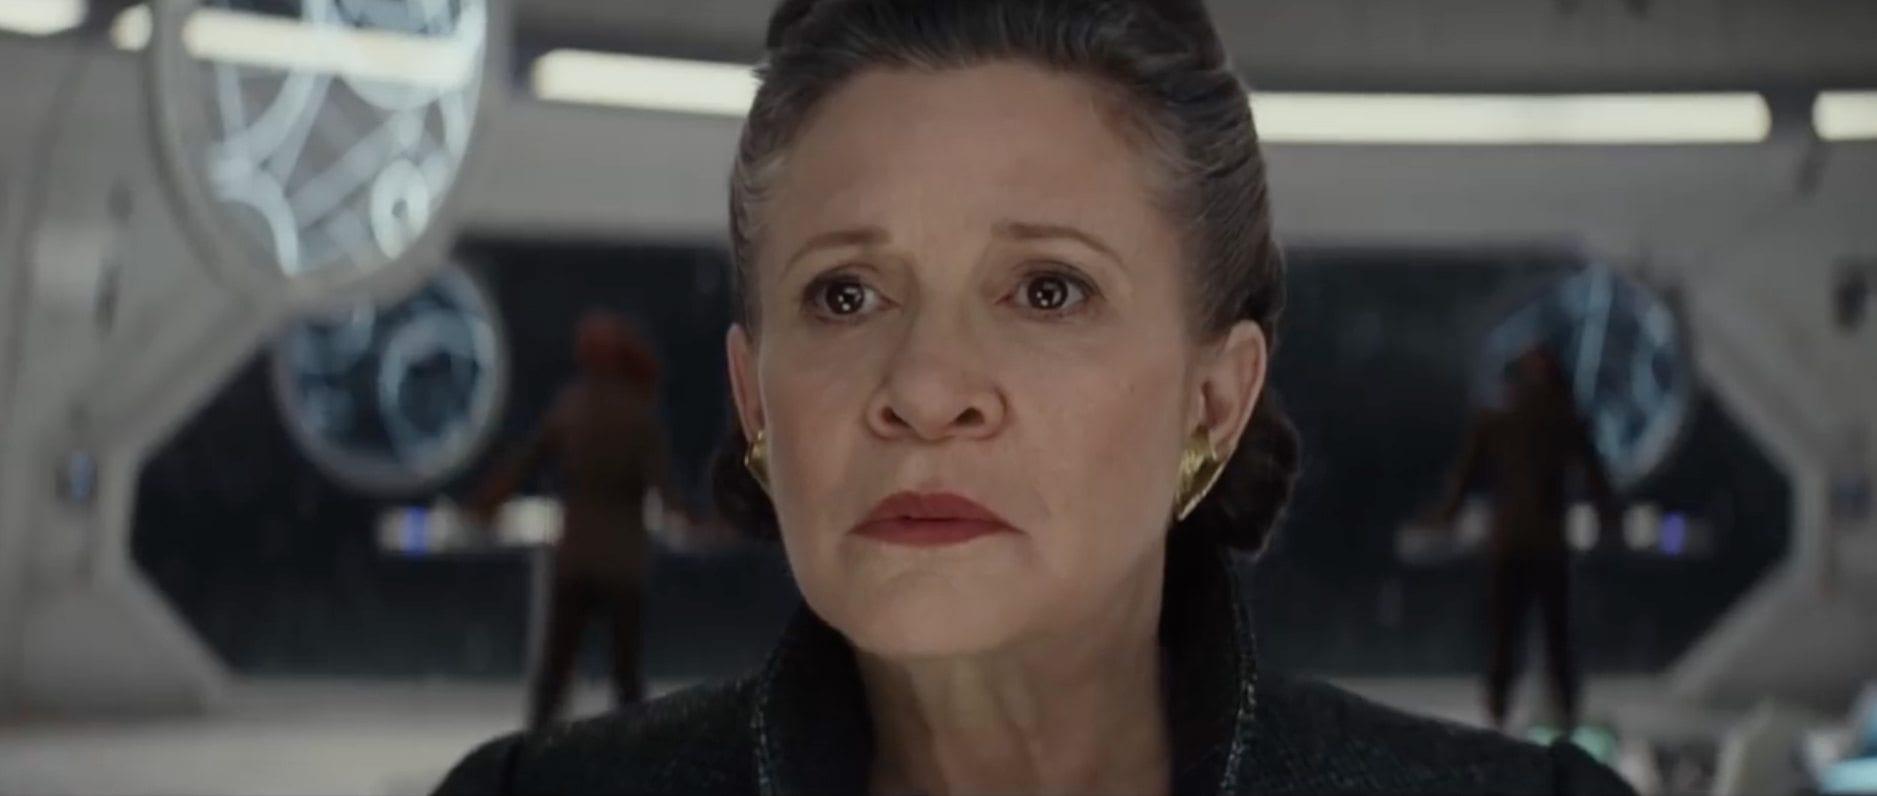 Star Wars The Last Jedi Novelization Review